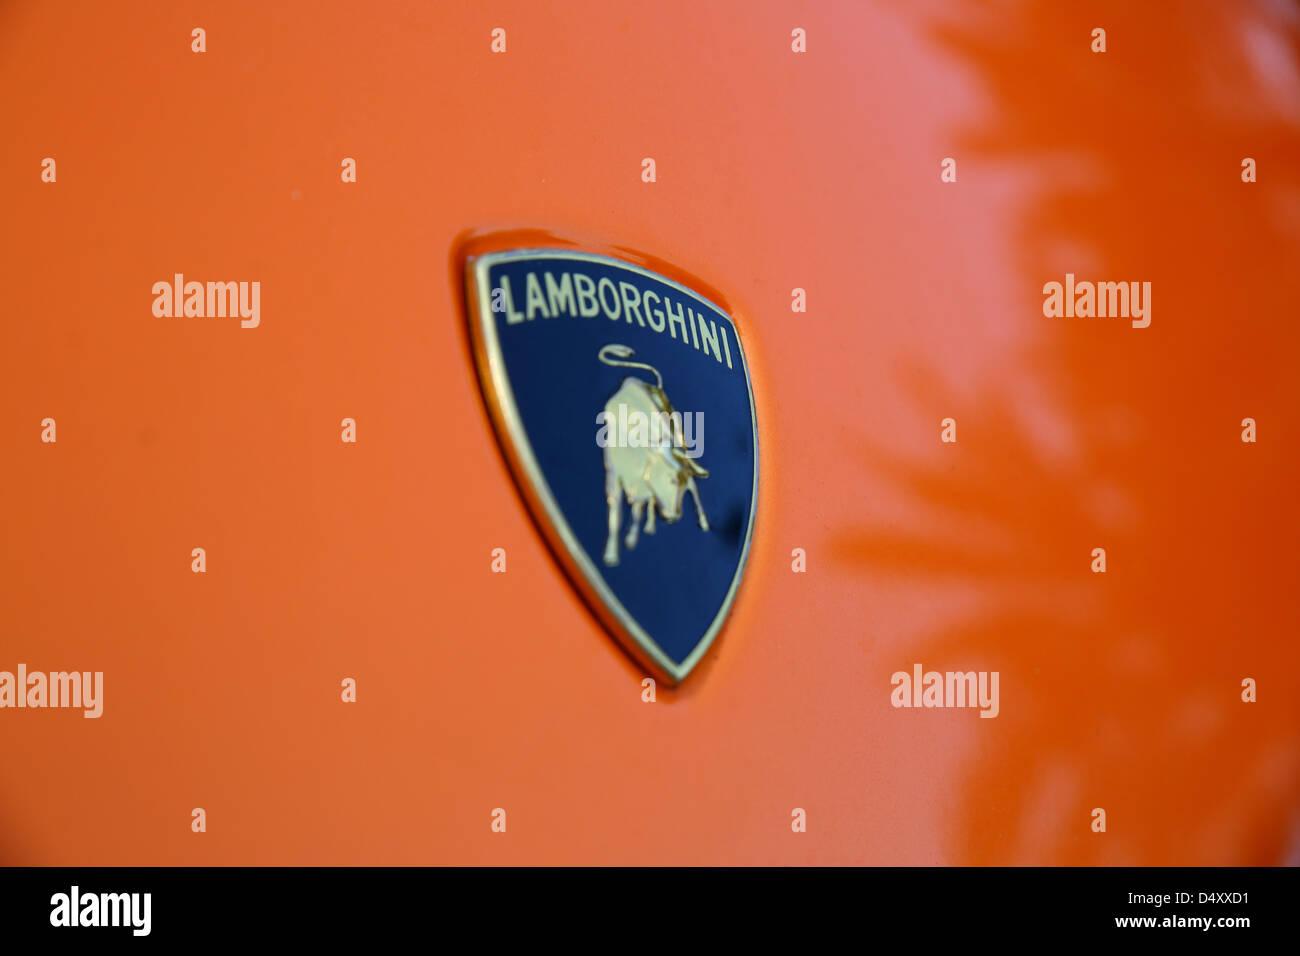 Lamborghini emblem, Dubai, United Arab Emirates - Stock Image